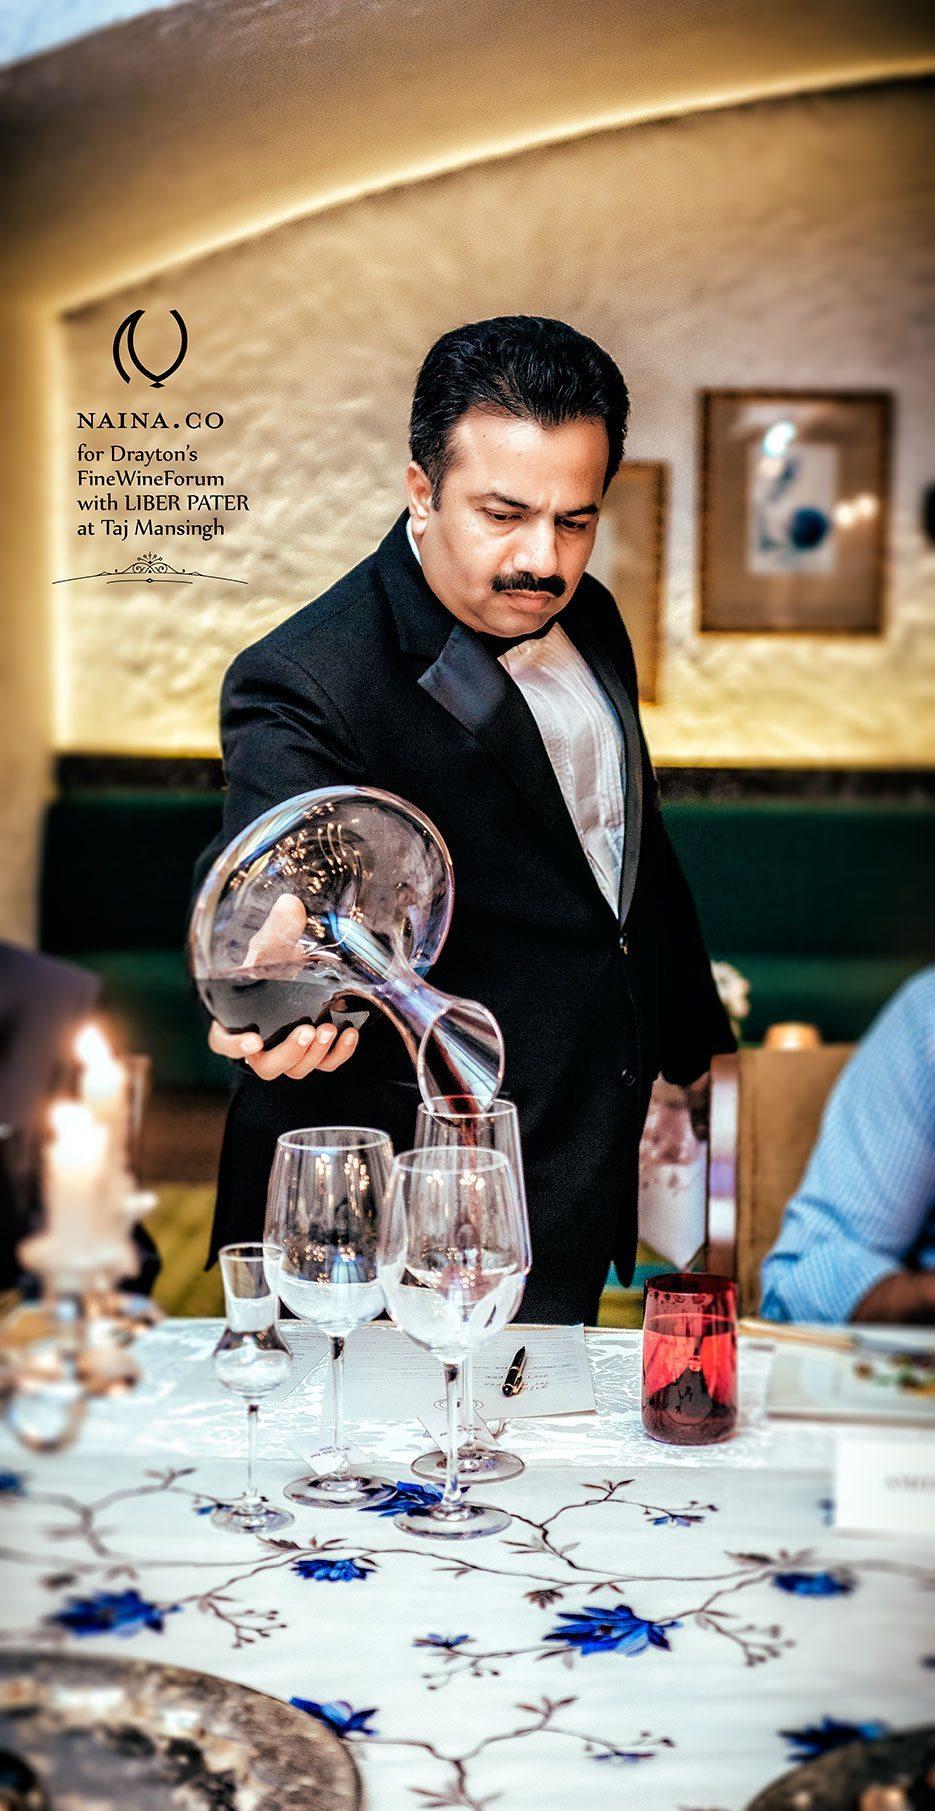 Drayton-Dinner-Evening-Fine-Wine-Forum-Naina.co-Raconteuse-Storyteller-Photographer